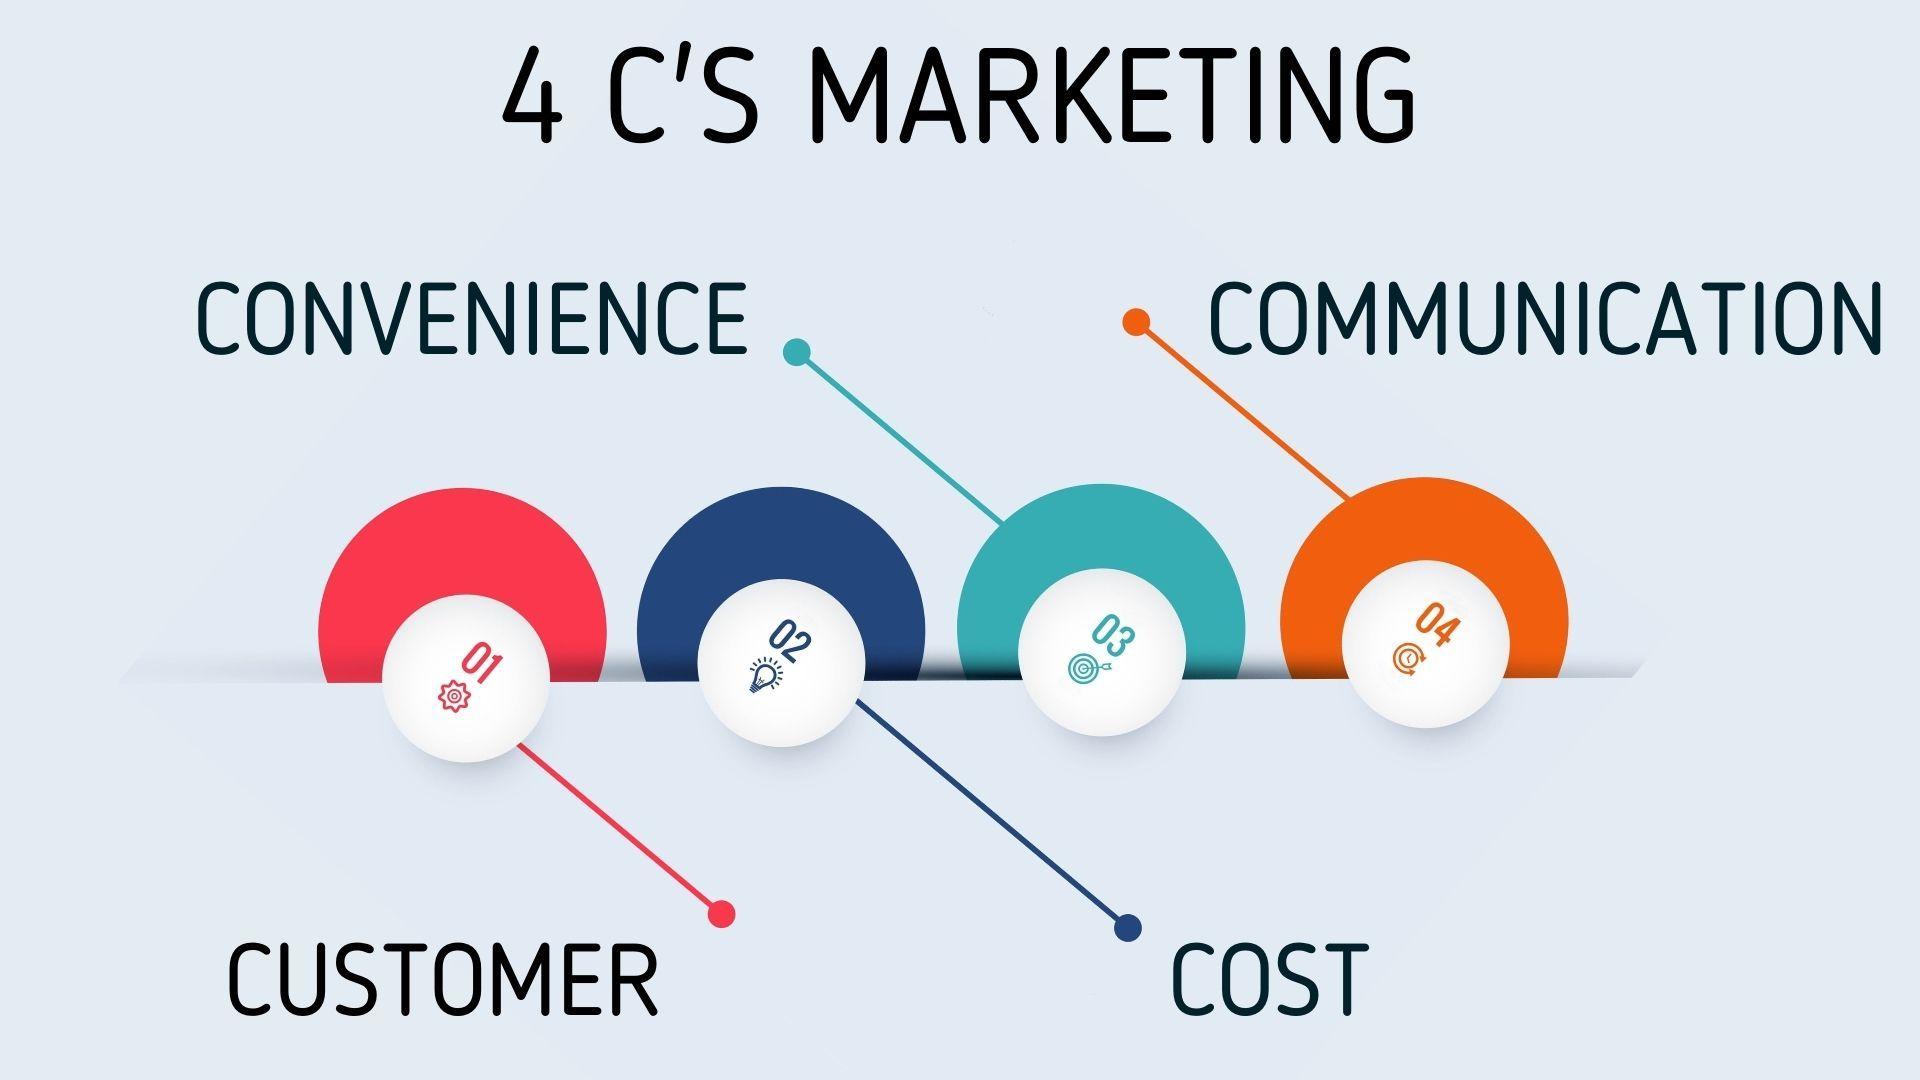 4 C's of Marketing